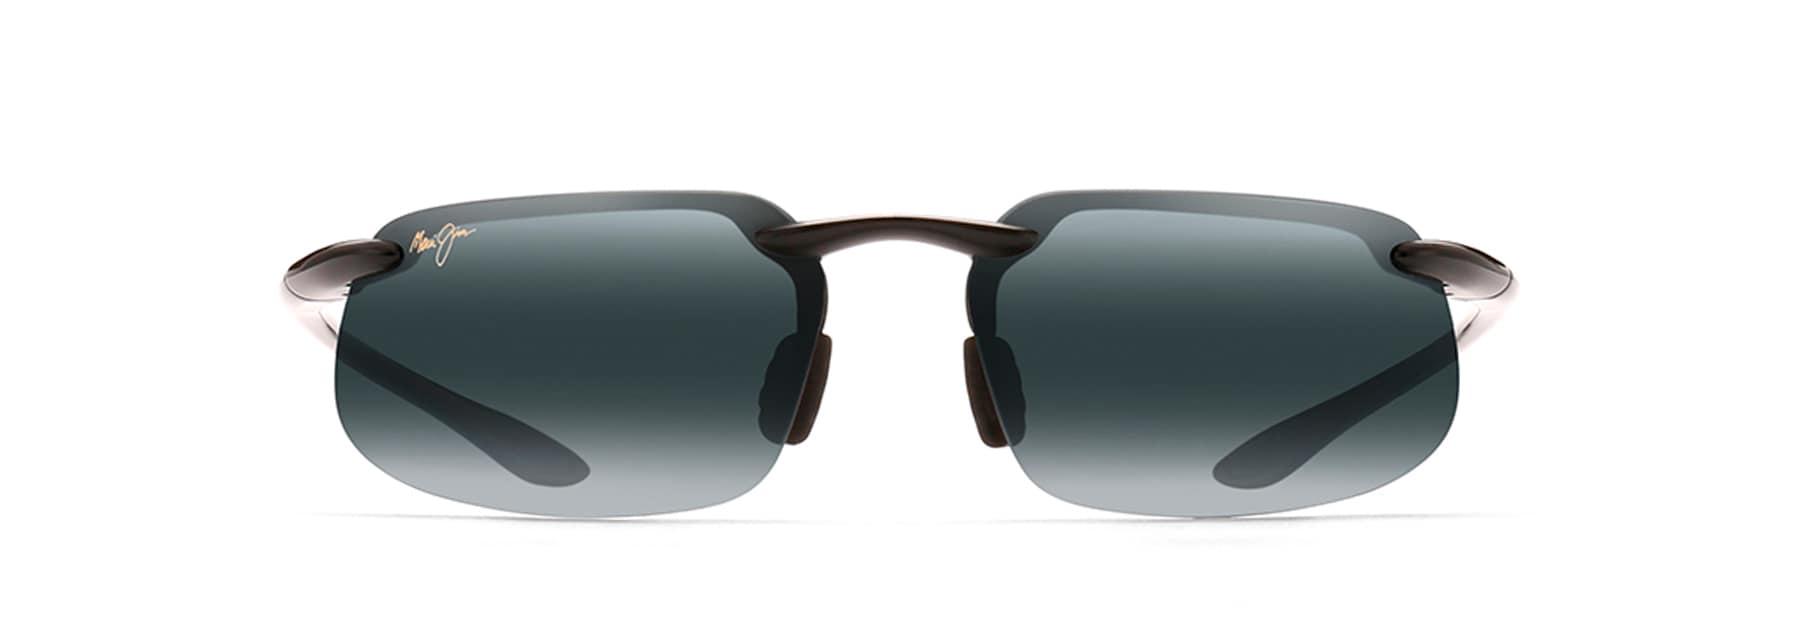 Rimless Kanaha Asian Kanaha Asian Fit Sunglasses Fit CoQreWExBd